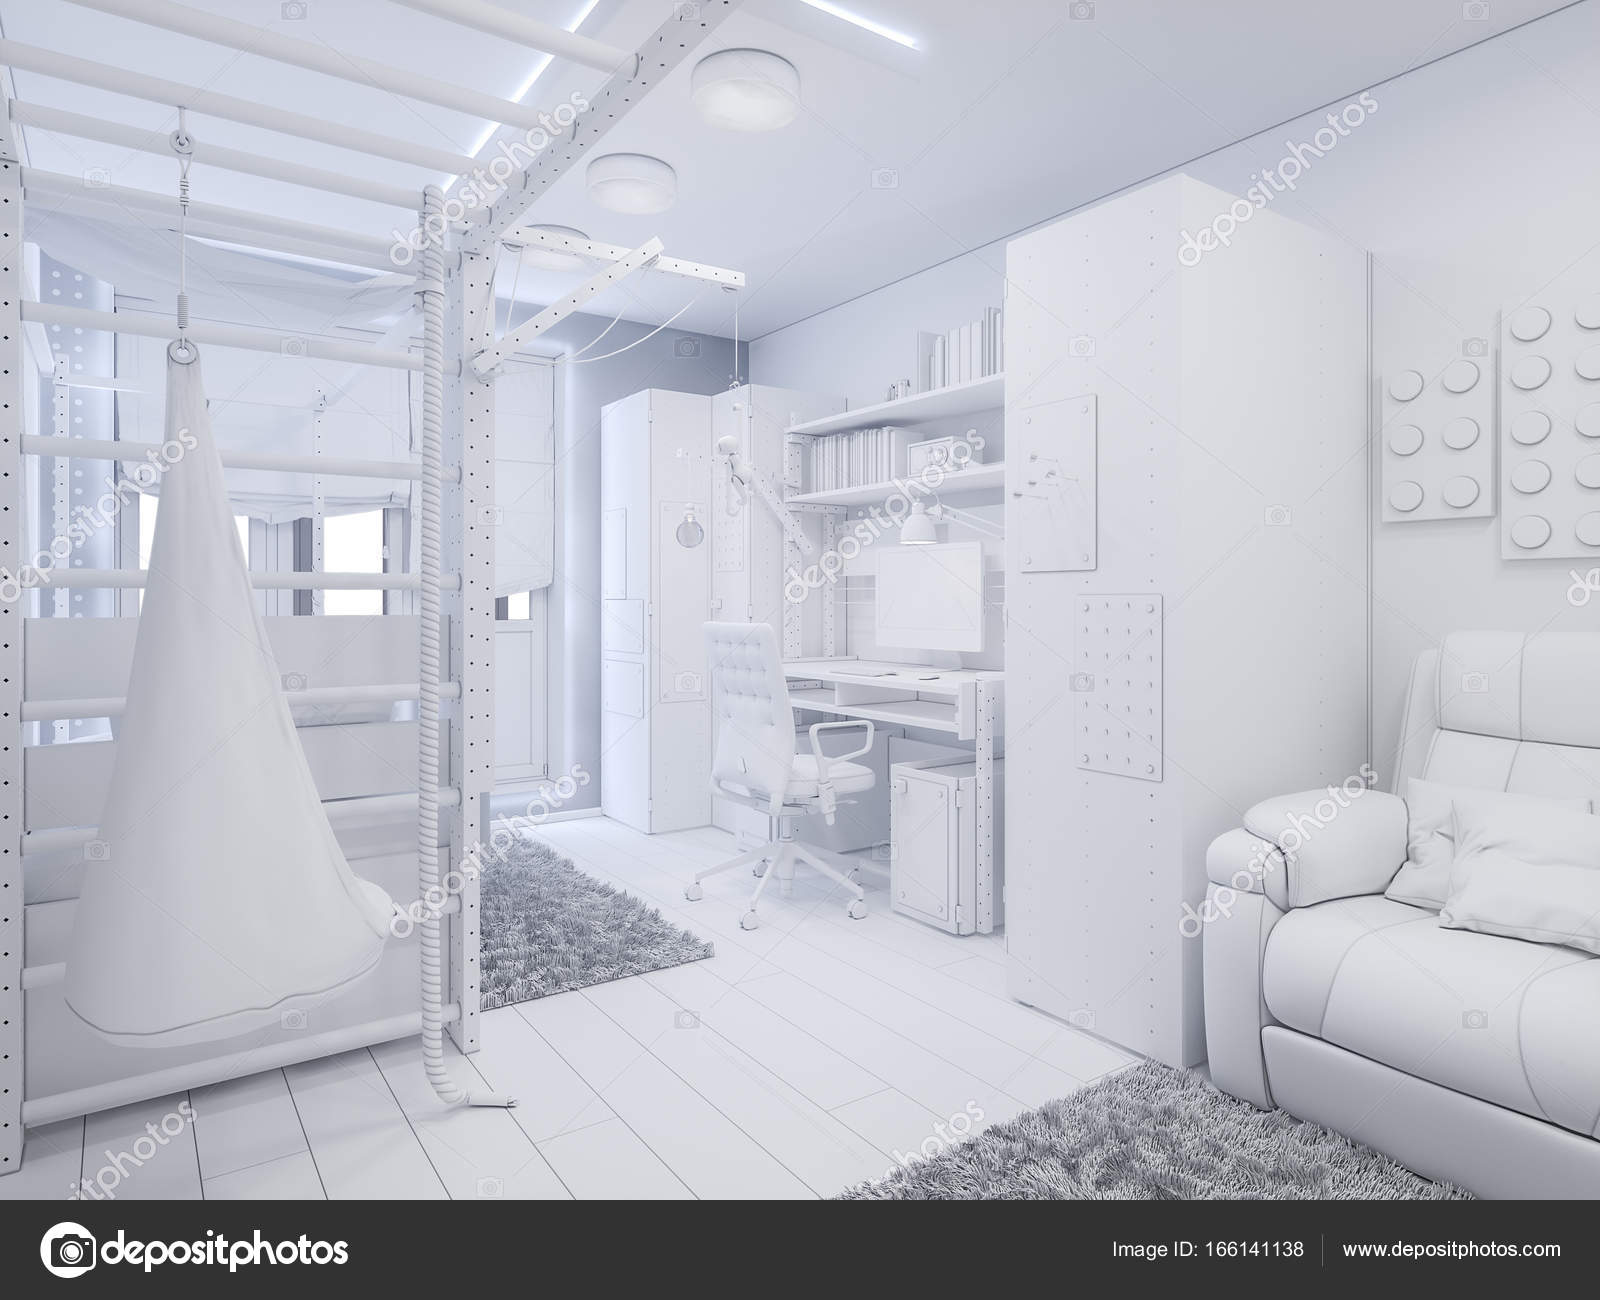 3d Illustration Childrens Room Interior Design Stock Photo C Richman21 166141138